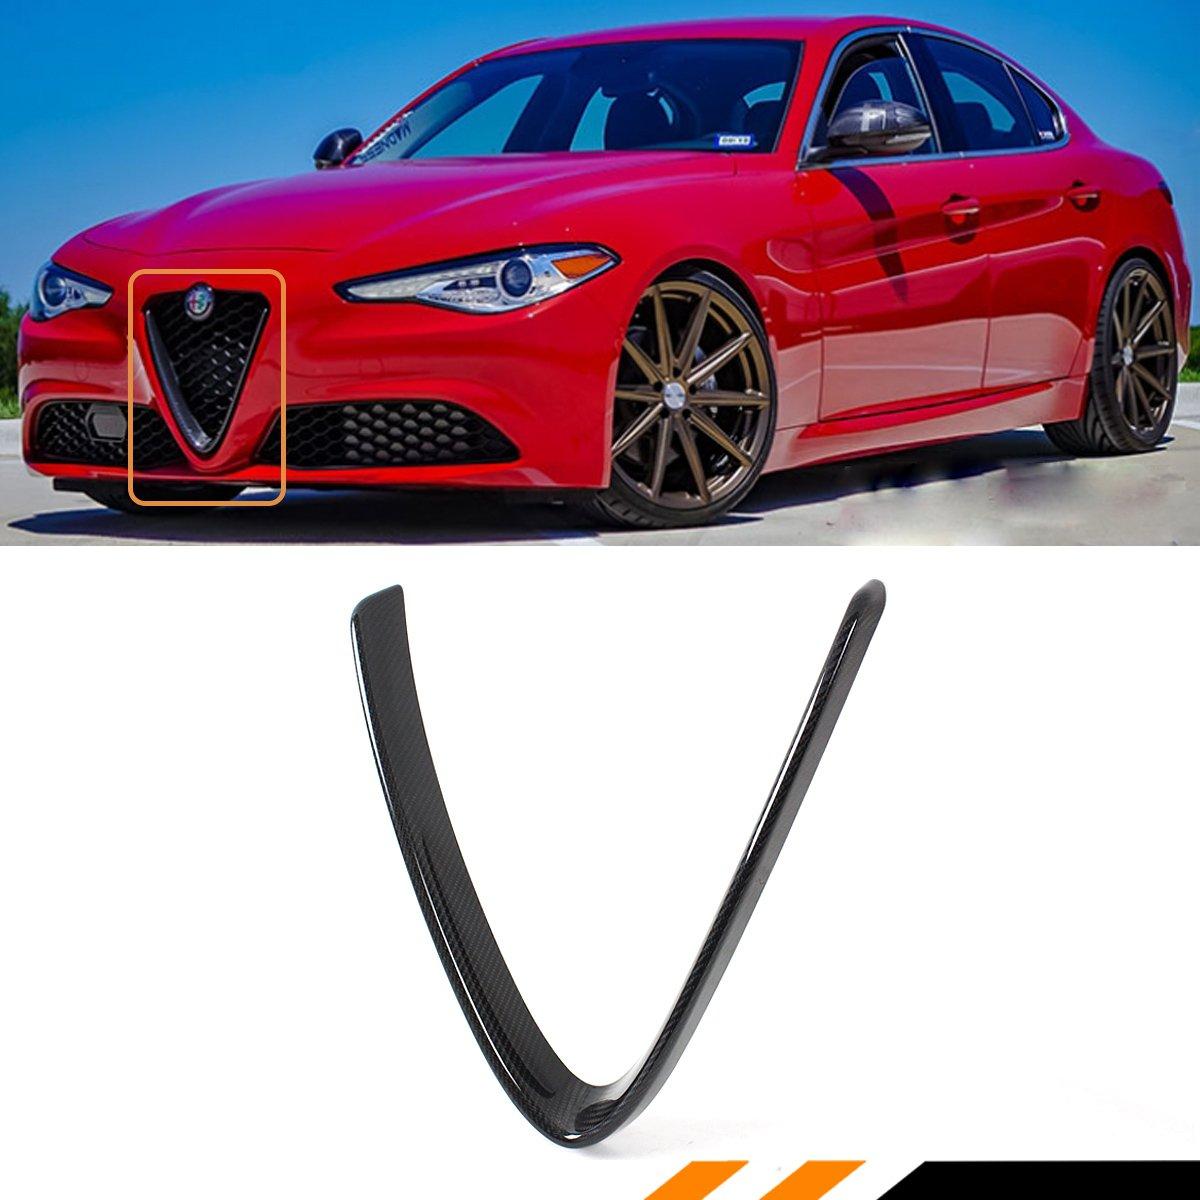 For 2017 2018 Alfa Romeo Giulia Base Ti Carbon Fiber Pinterest Front V Shape Grille Cover Outline Trim Automotive